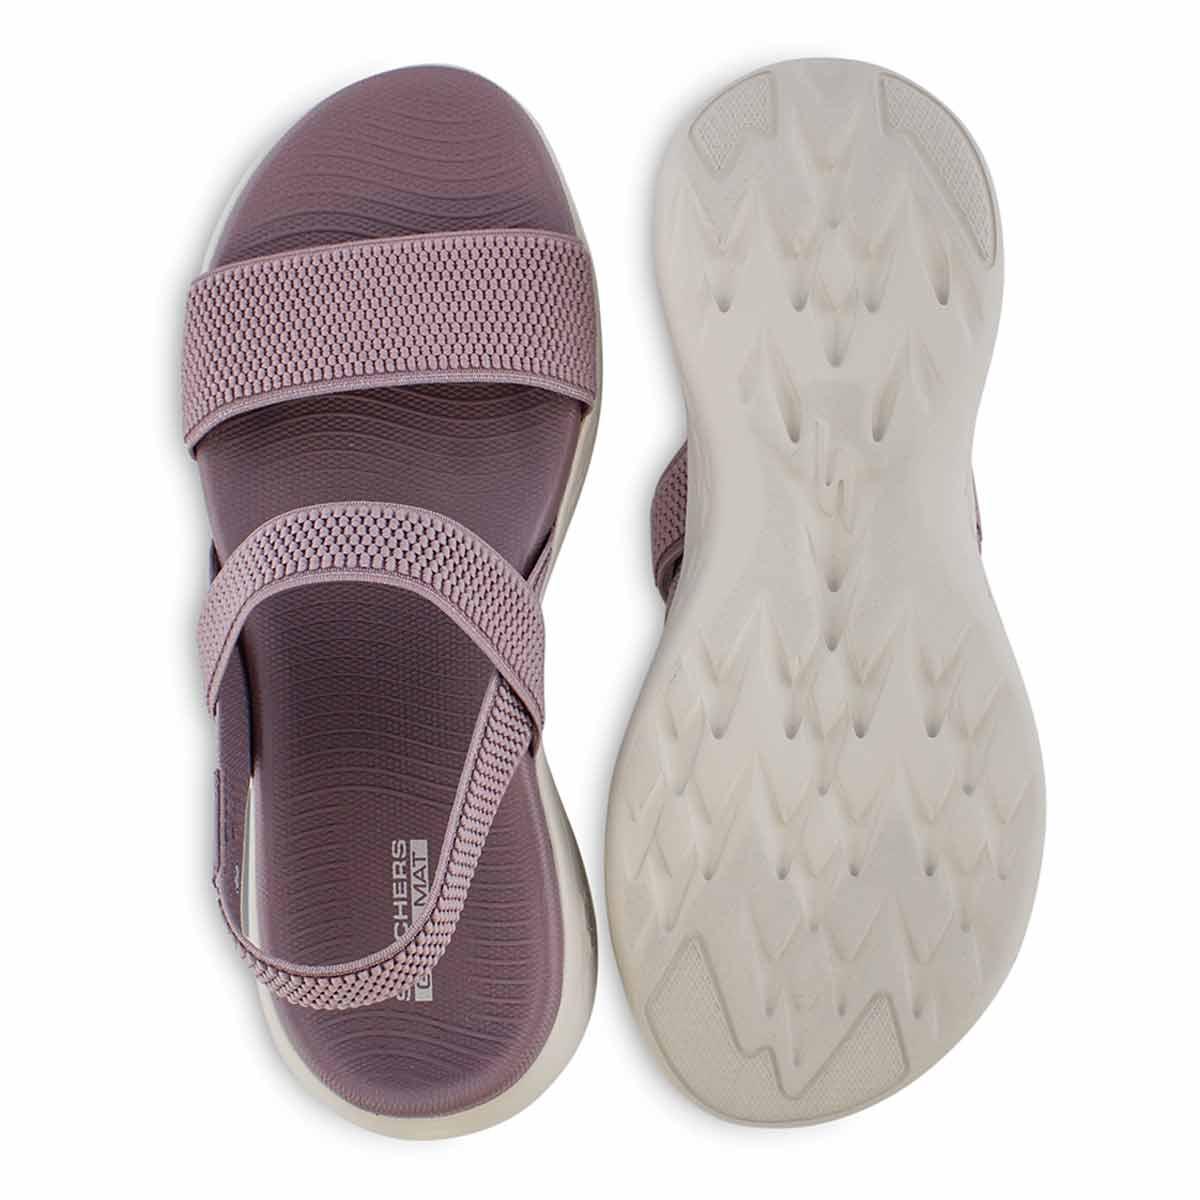 Sandales sport, ON-THE-GO 600, mauves, femmes